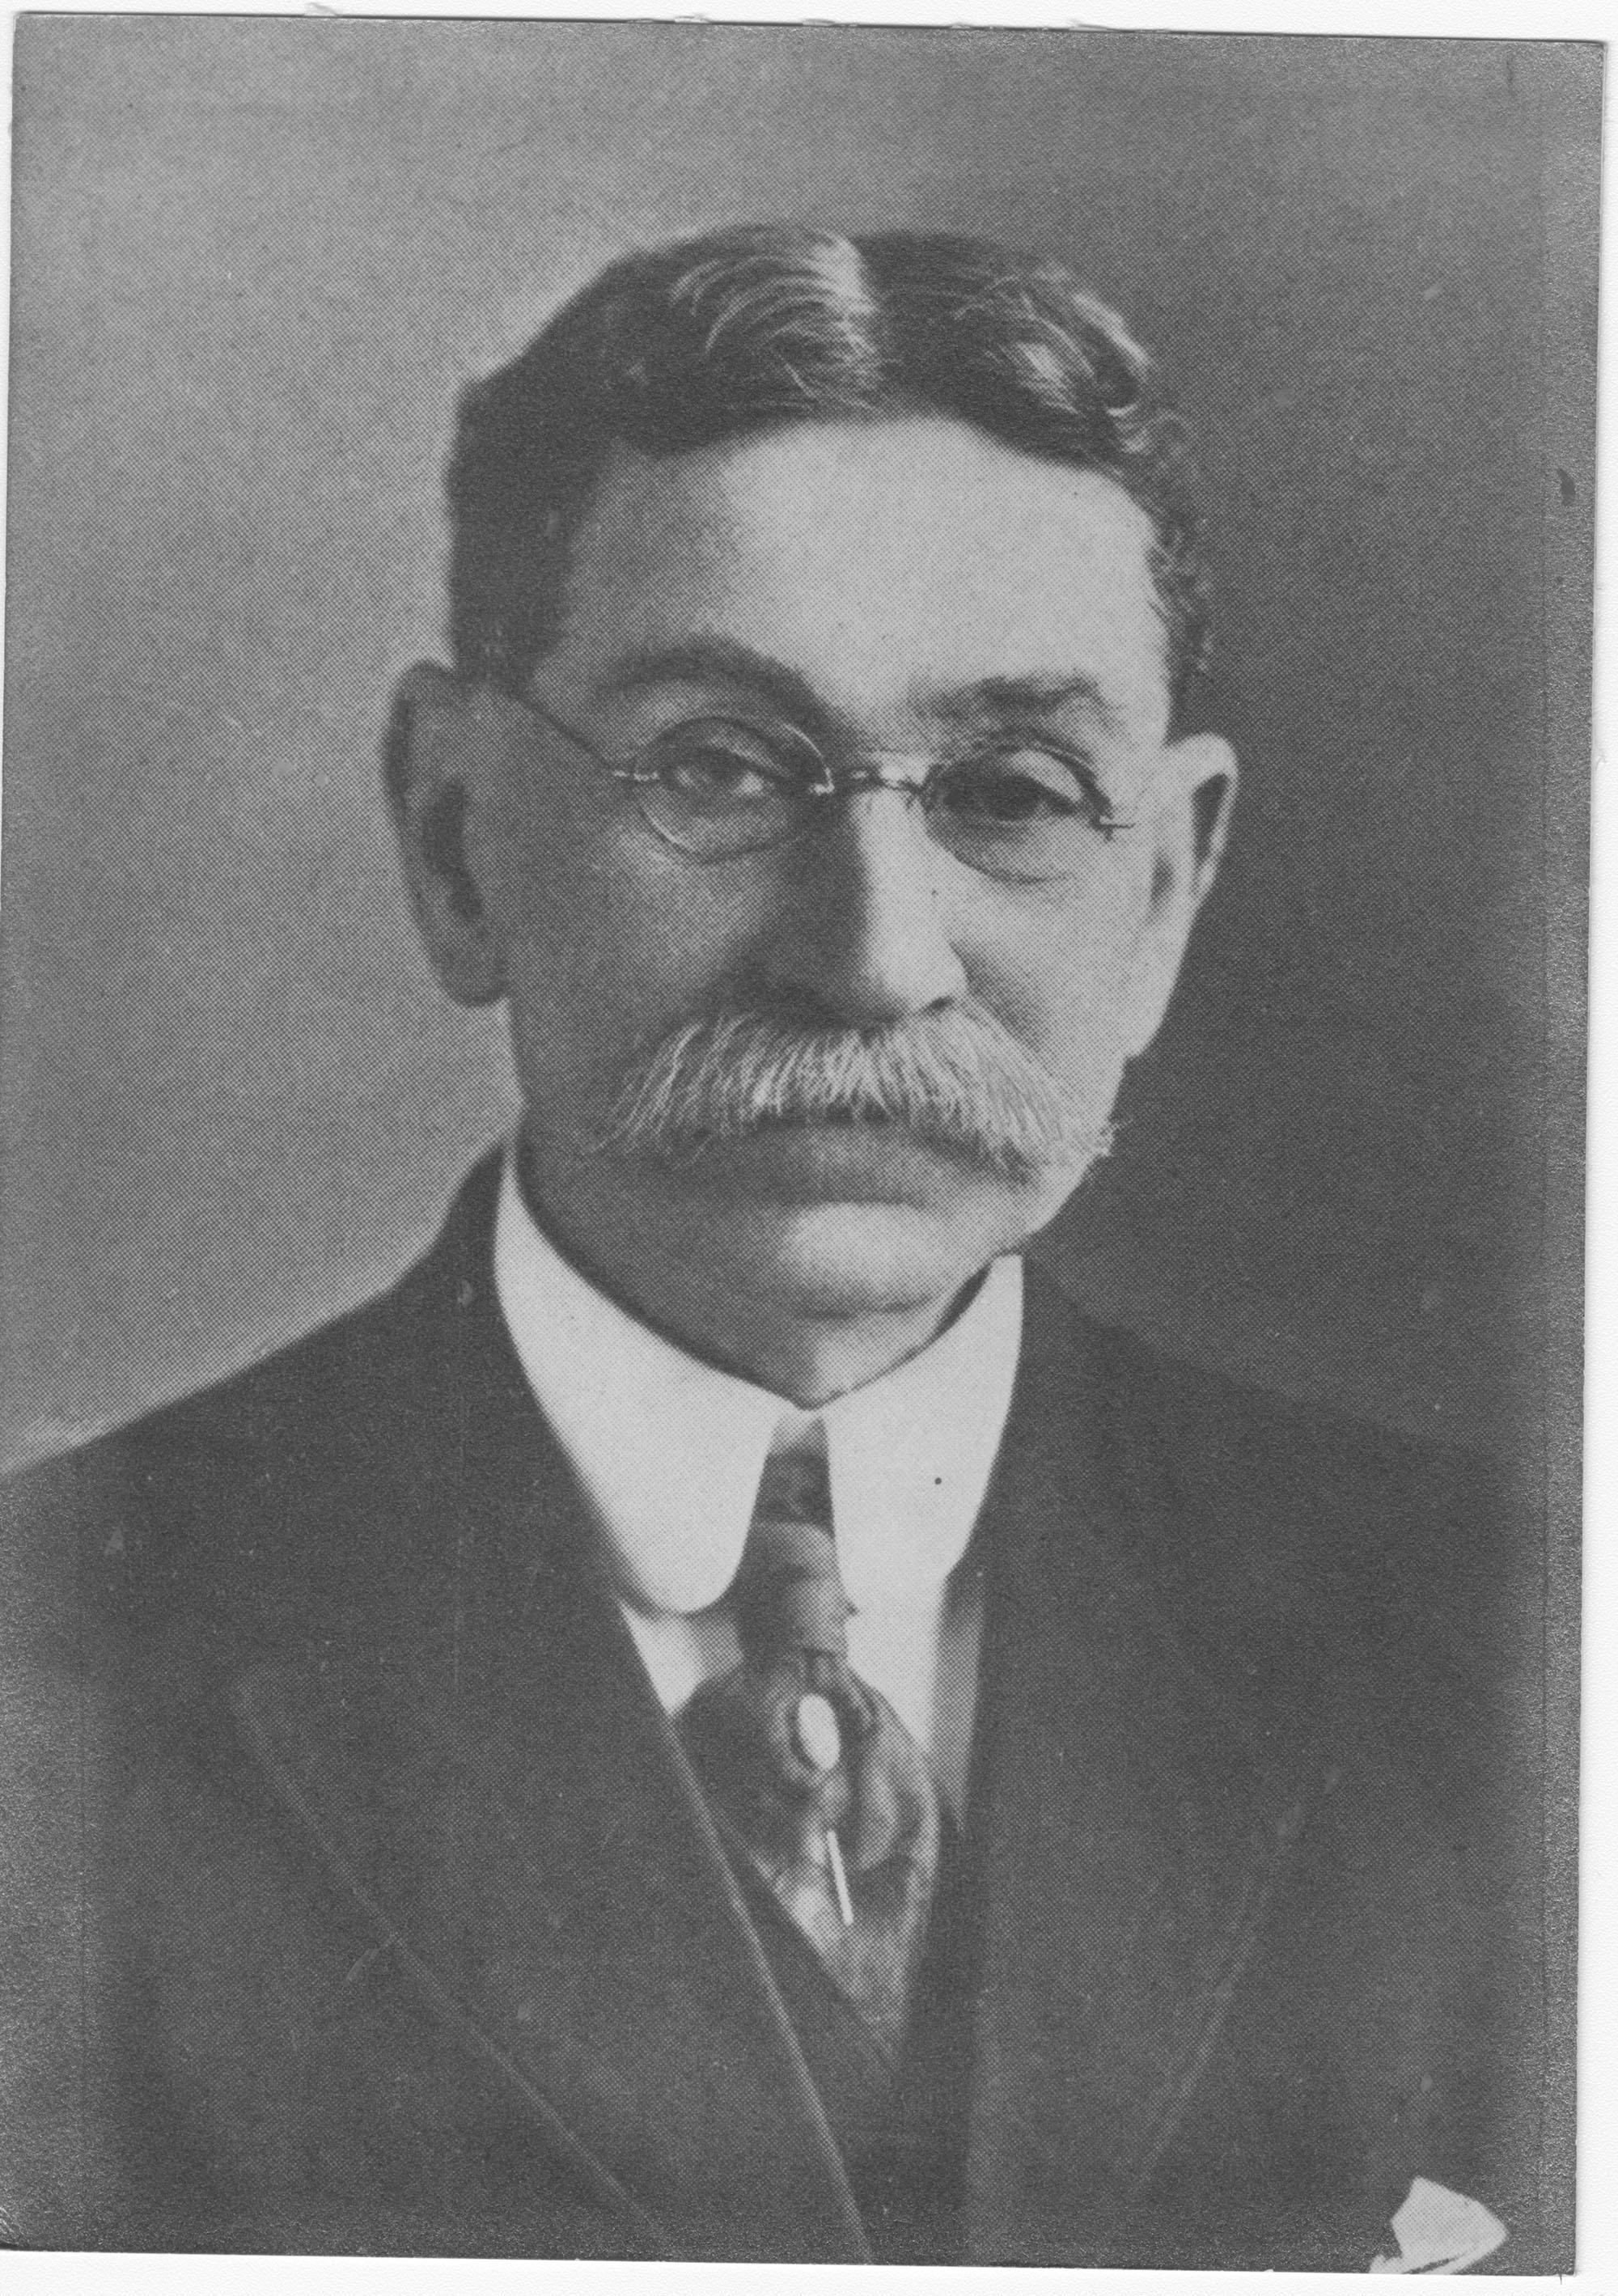 Stephen E. Welch